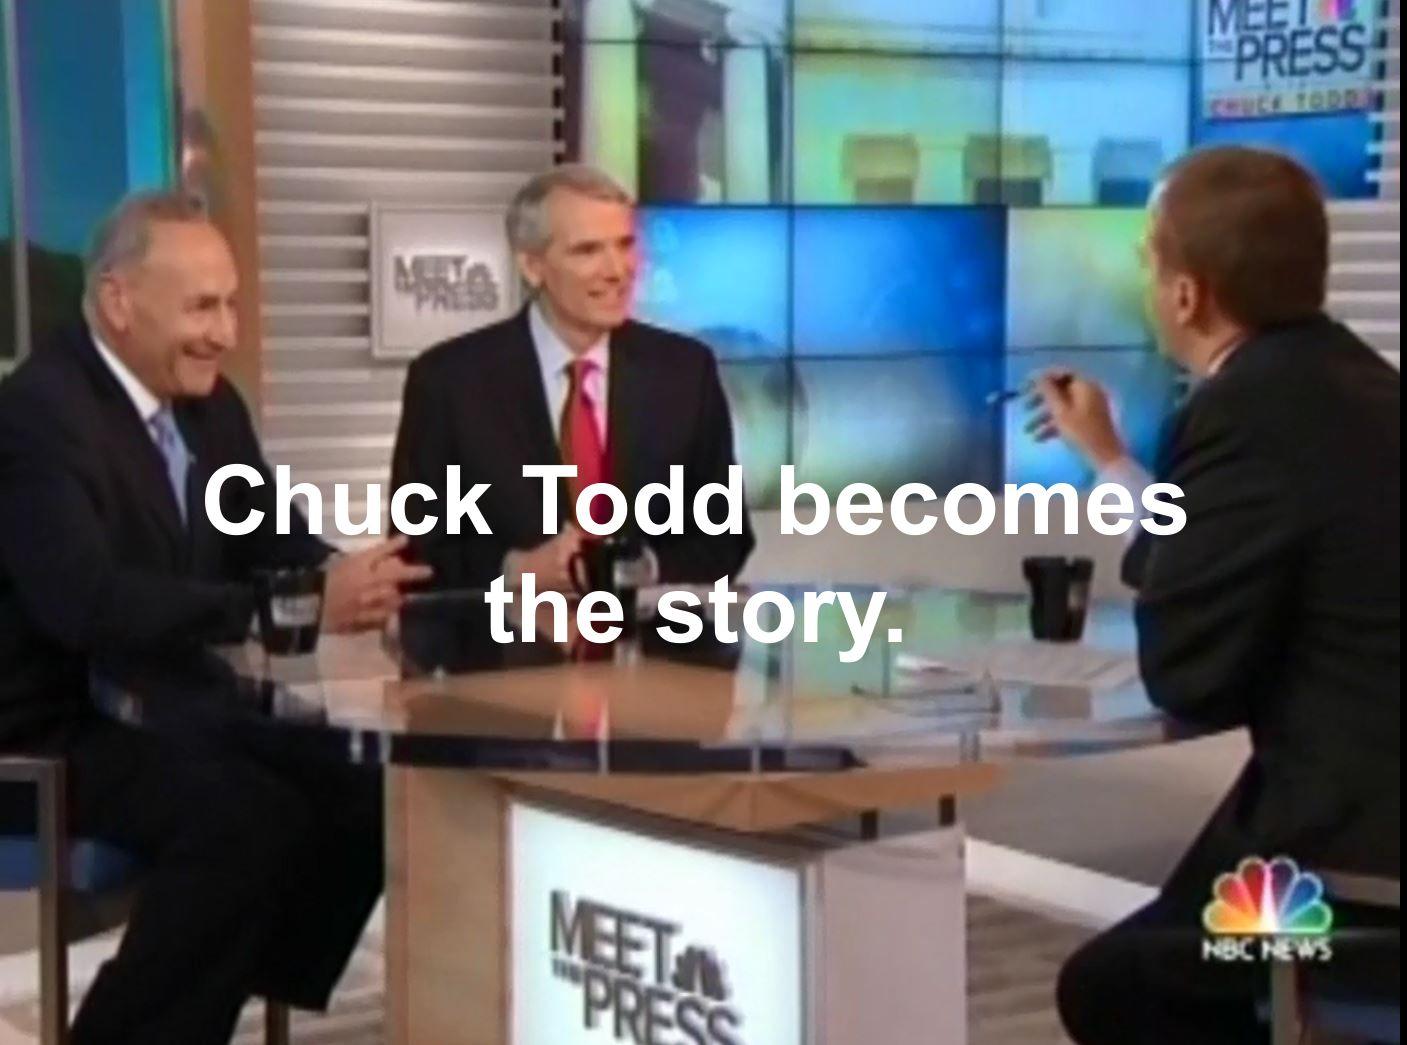 Chuck Todd's journalistic fail comes back to bite him